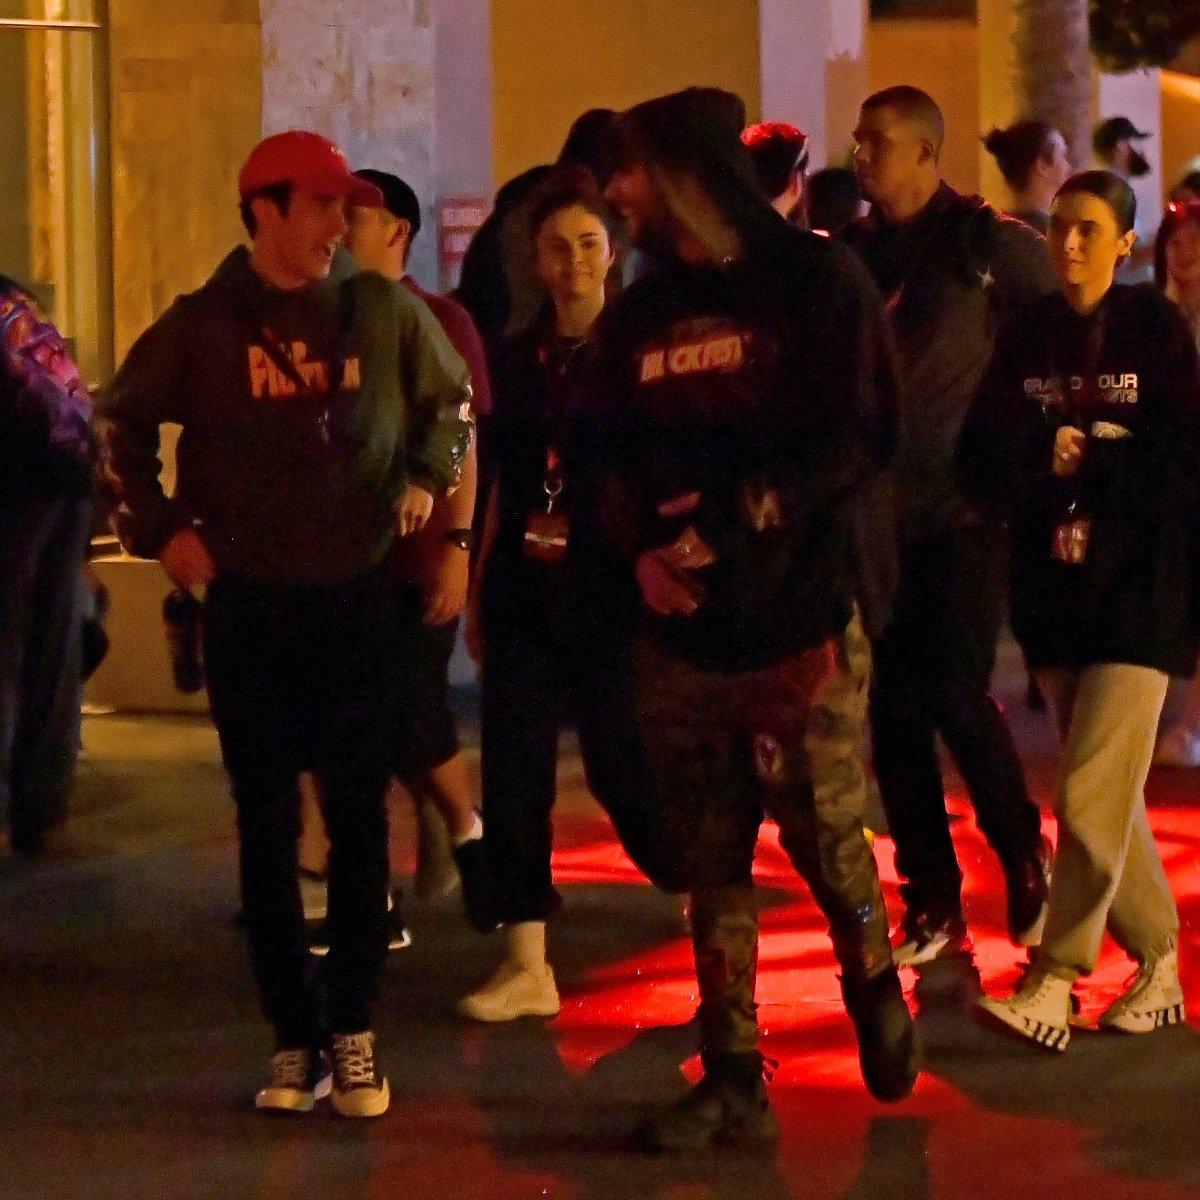 Spooky Season Is Here! Selena Gomez Spotted Having Fun at Universal's Halloween Horror Nights